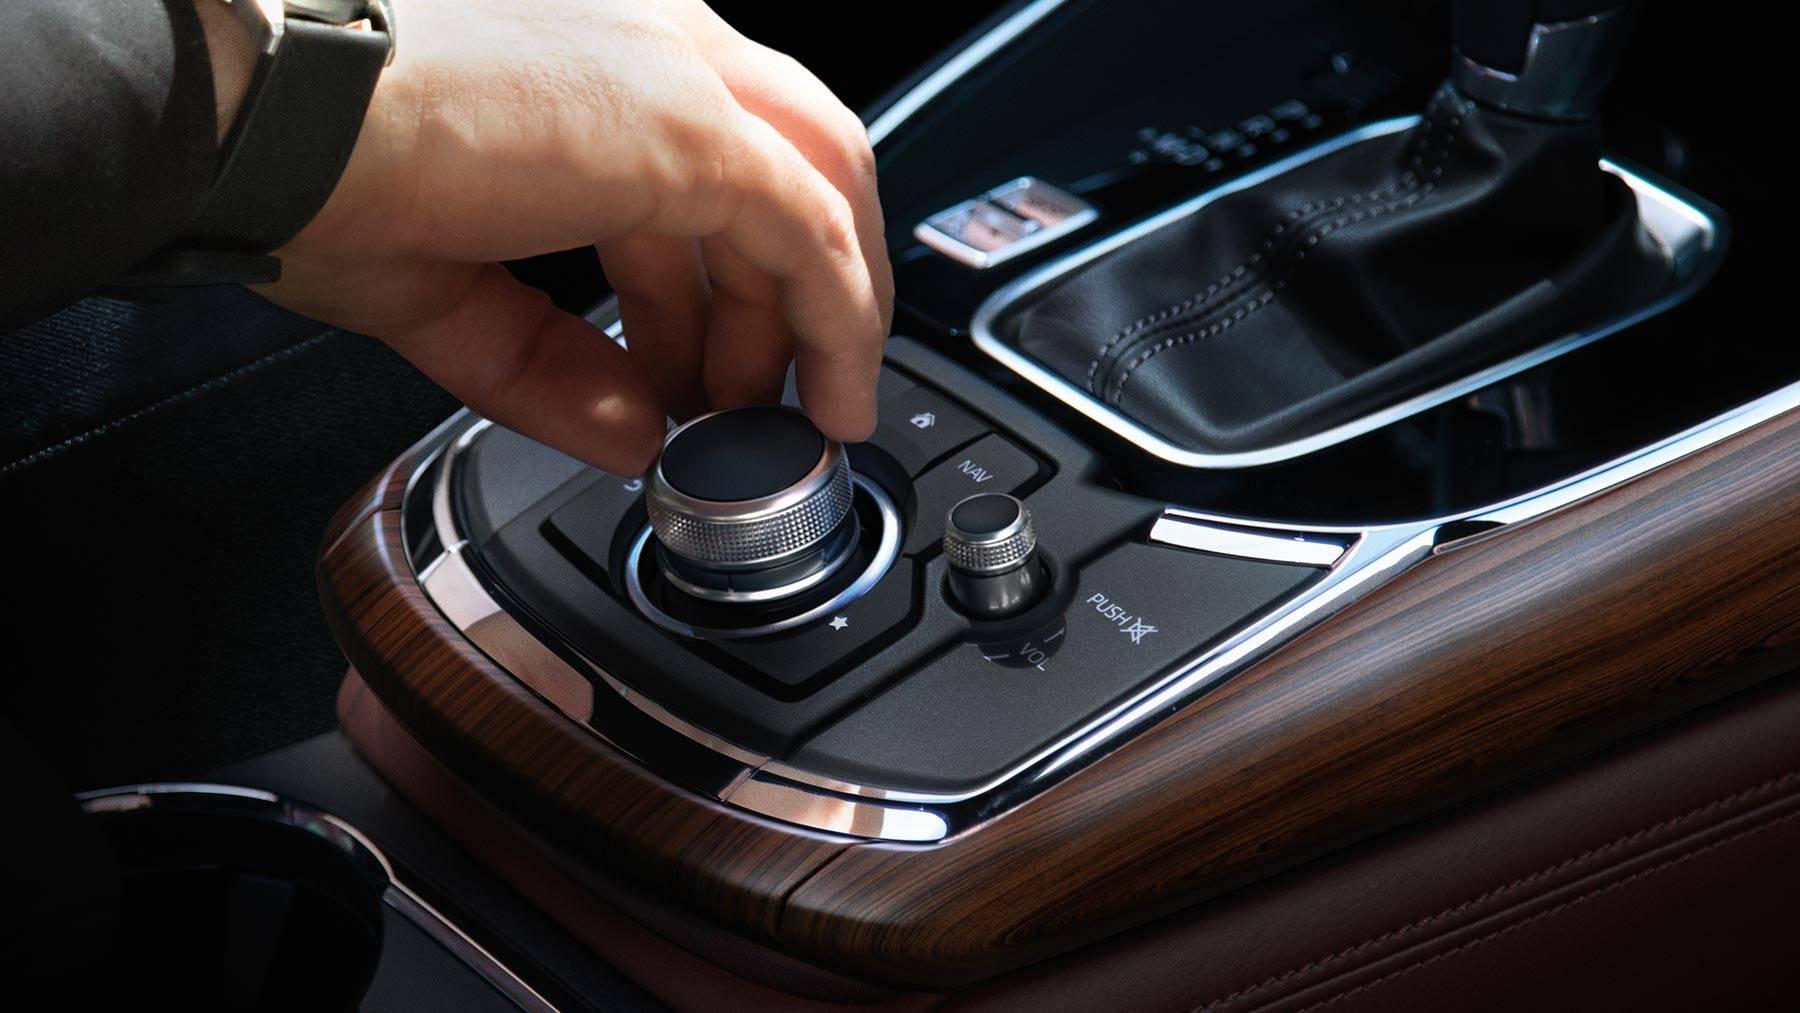 Driving Controls in the 2019 Mazda CX-9